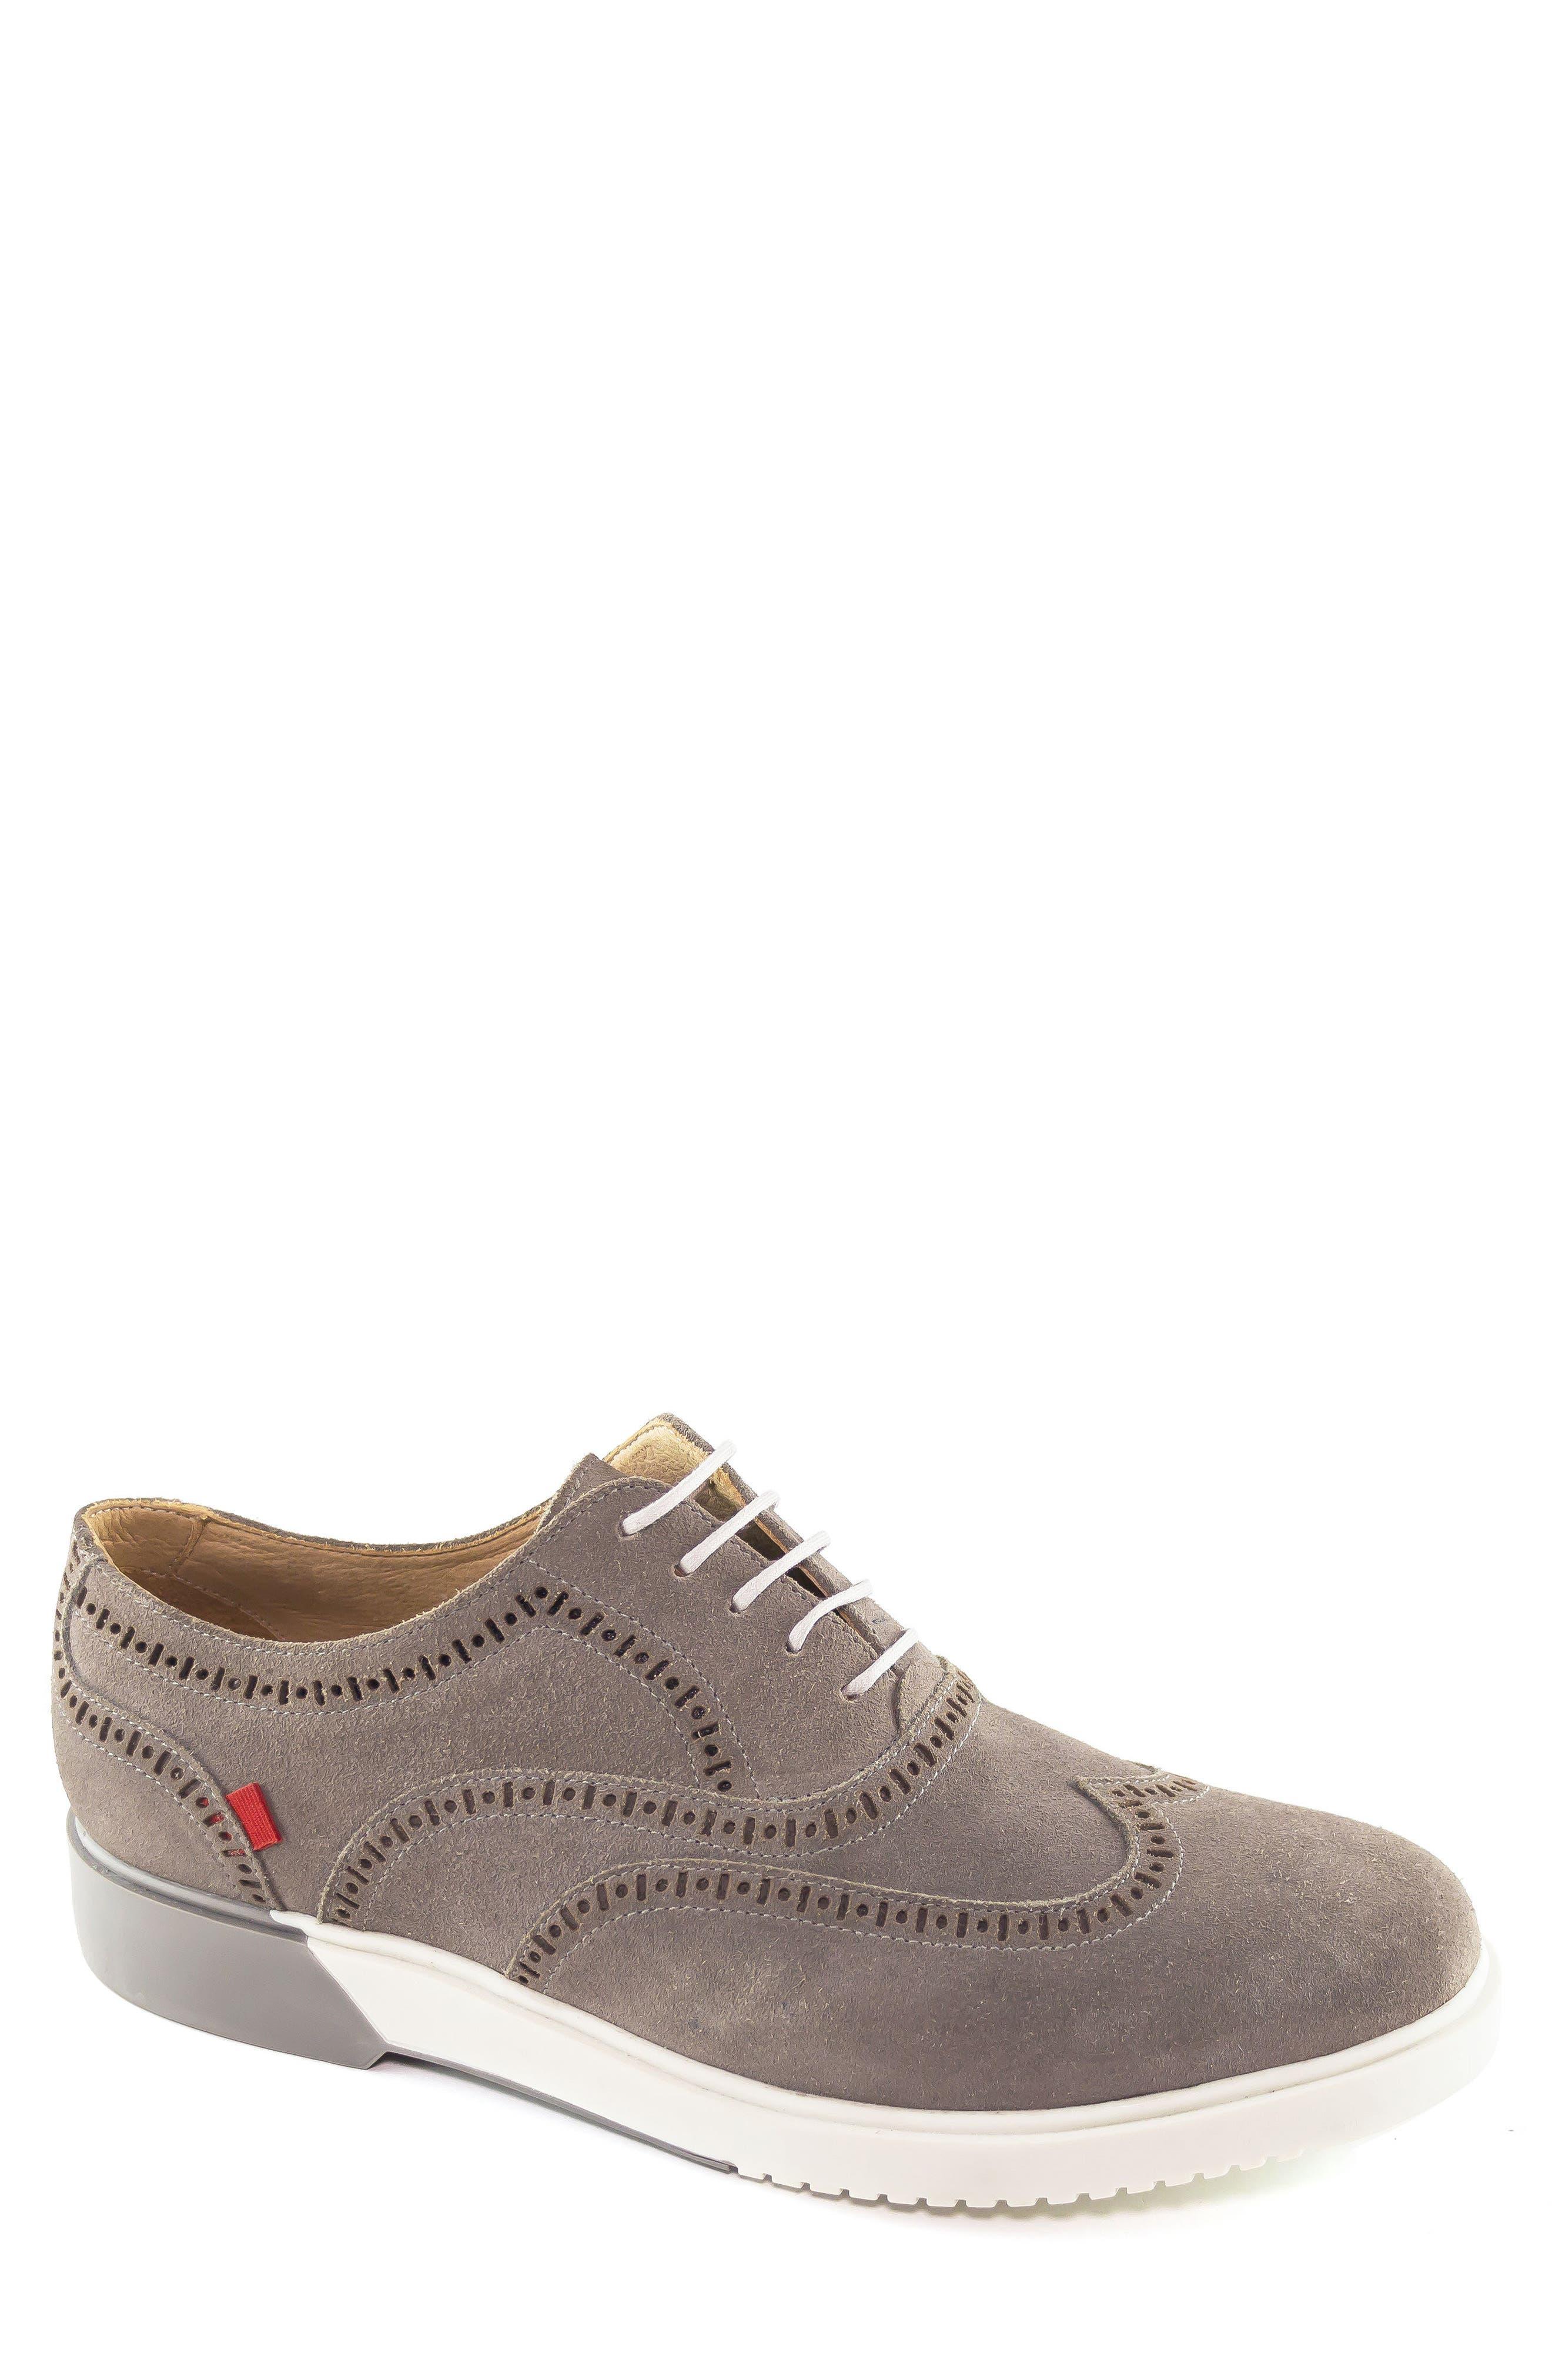 Main Image - Marc Joseph New York 5th Ave Wingtip Sneaker (Men)